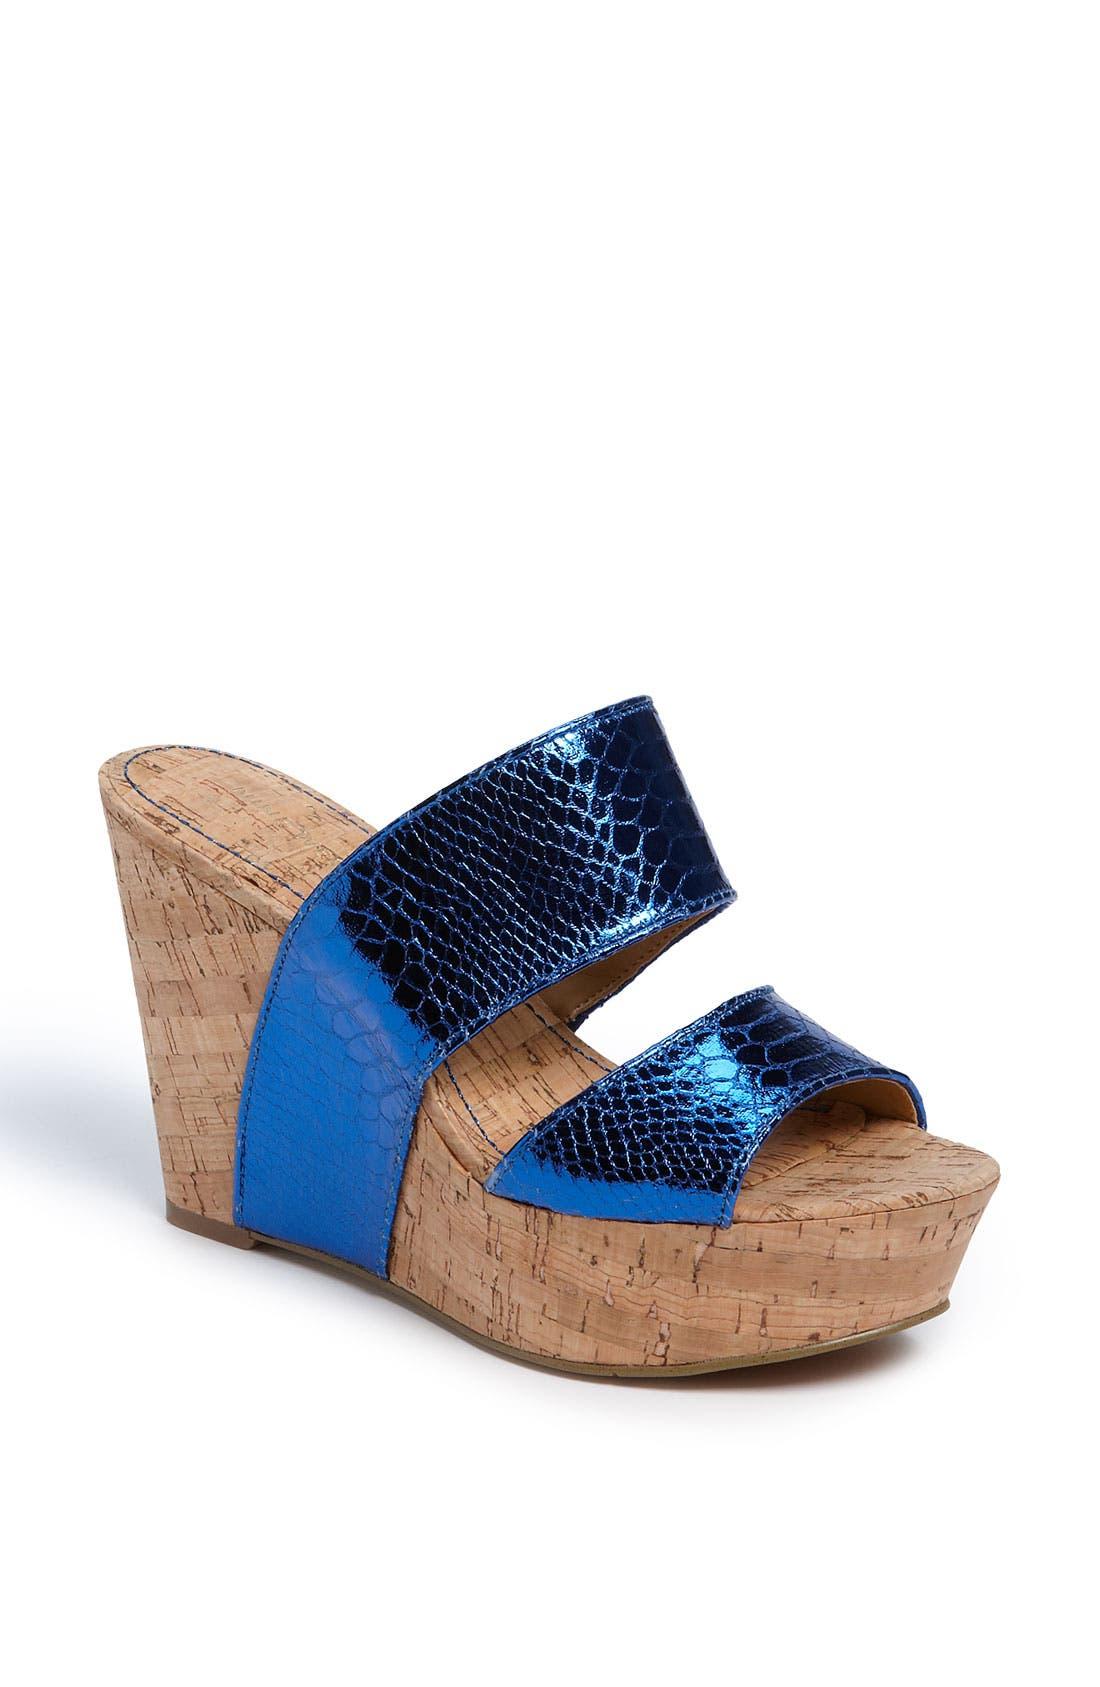 Alternate Image 1 Selected - Nine West 'Larysa' Wedge Sandal